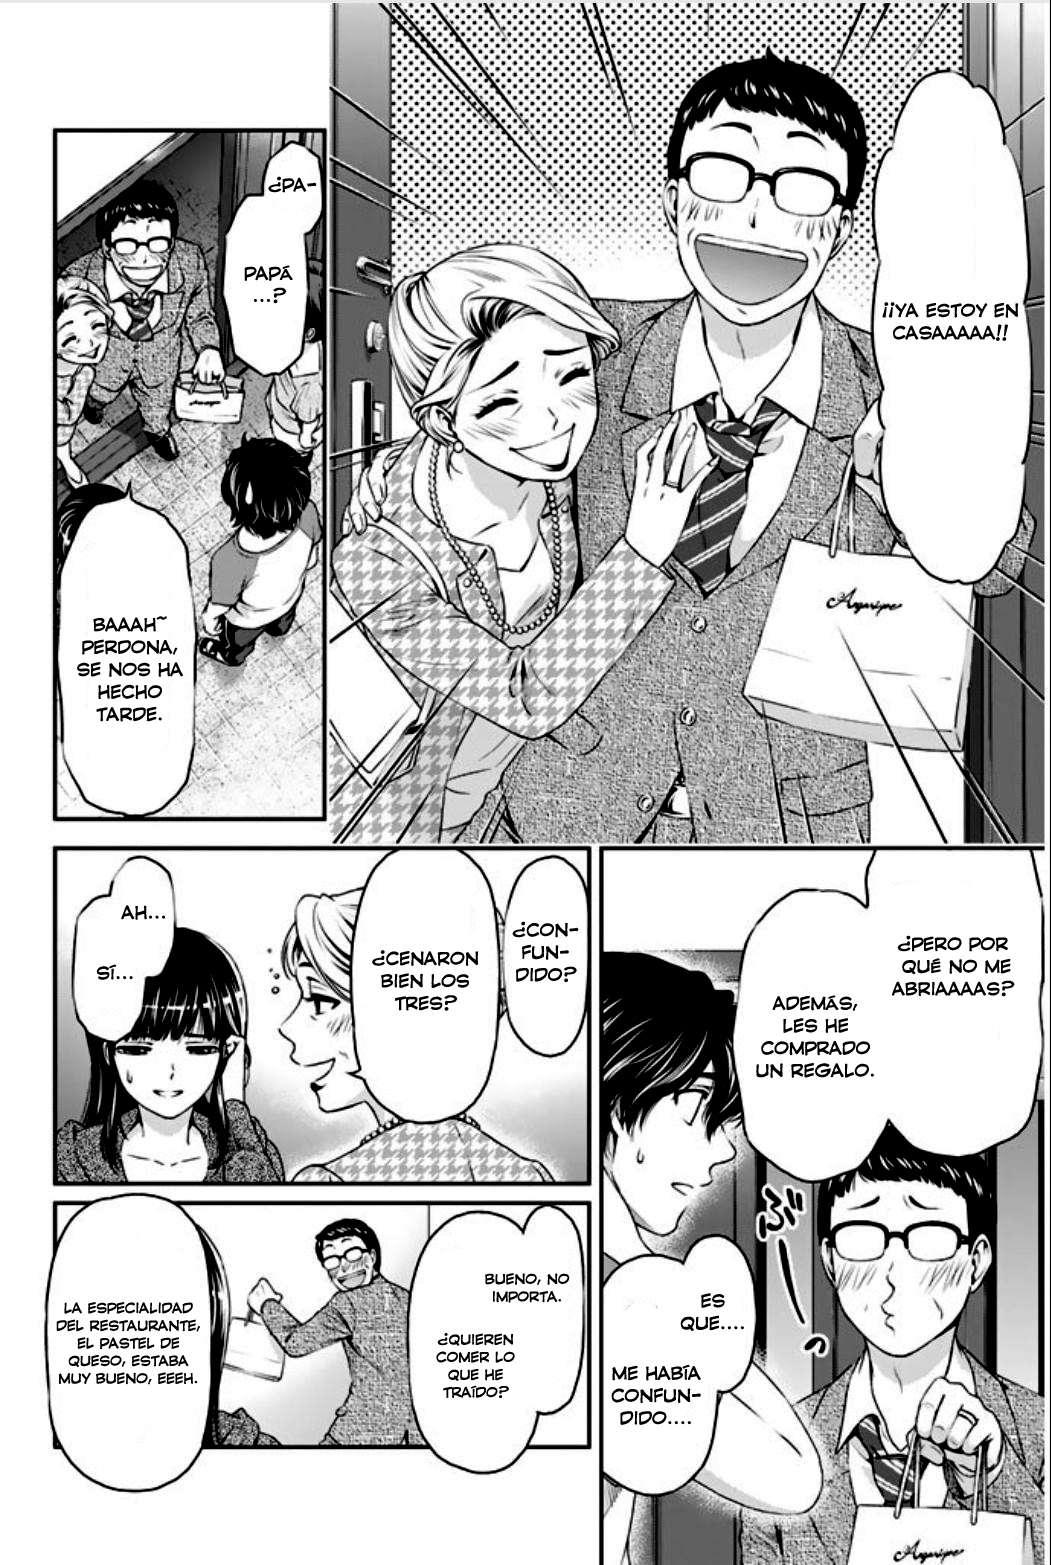 https://c5.ninemanga.com/es_manga/9/14345/356018/6c6418b792029402e818aaaf39ab867b.jpg Page 5